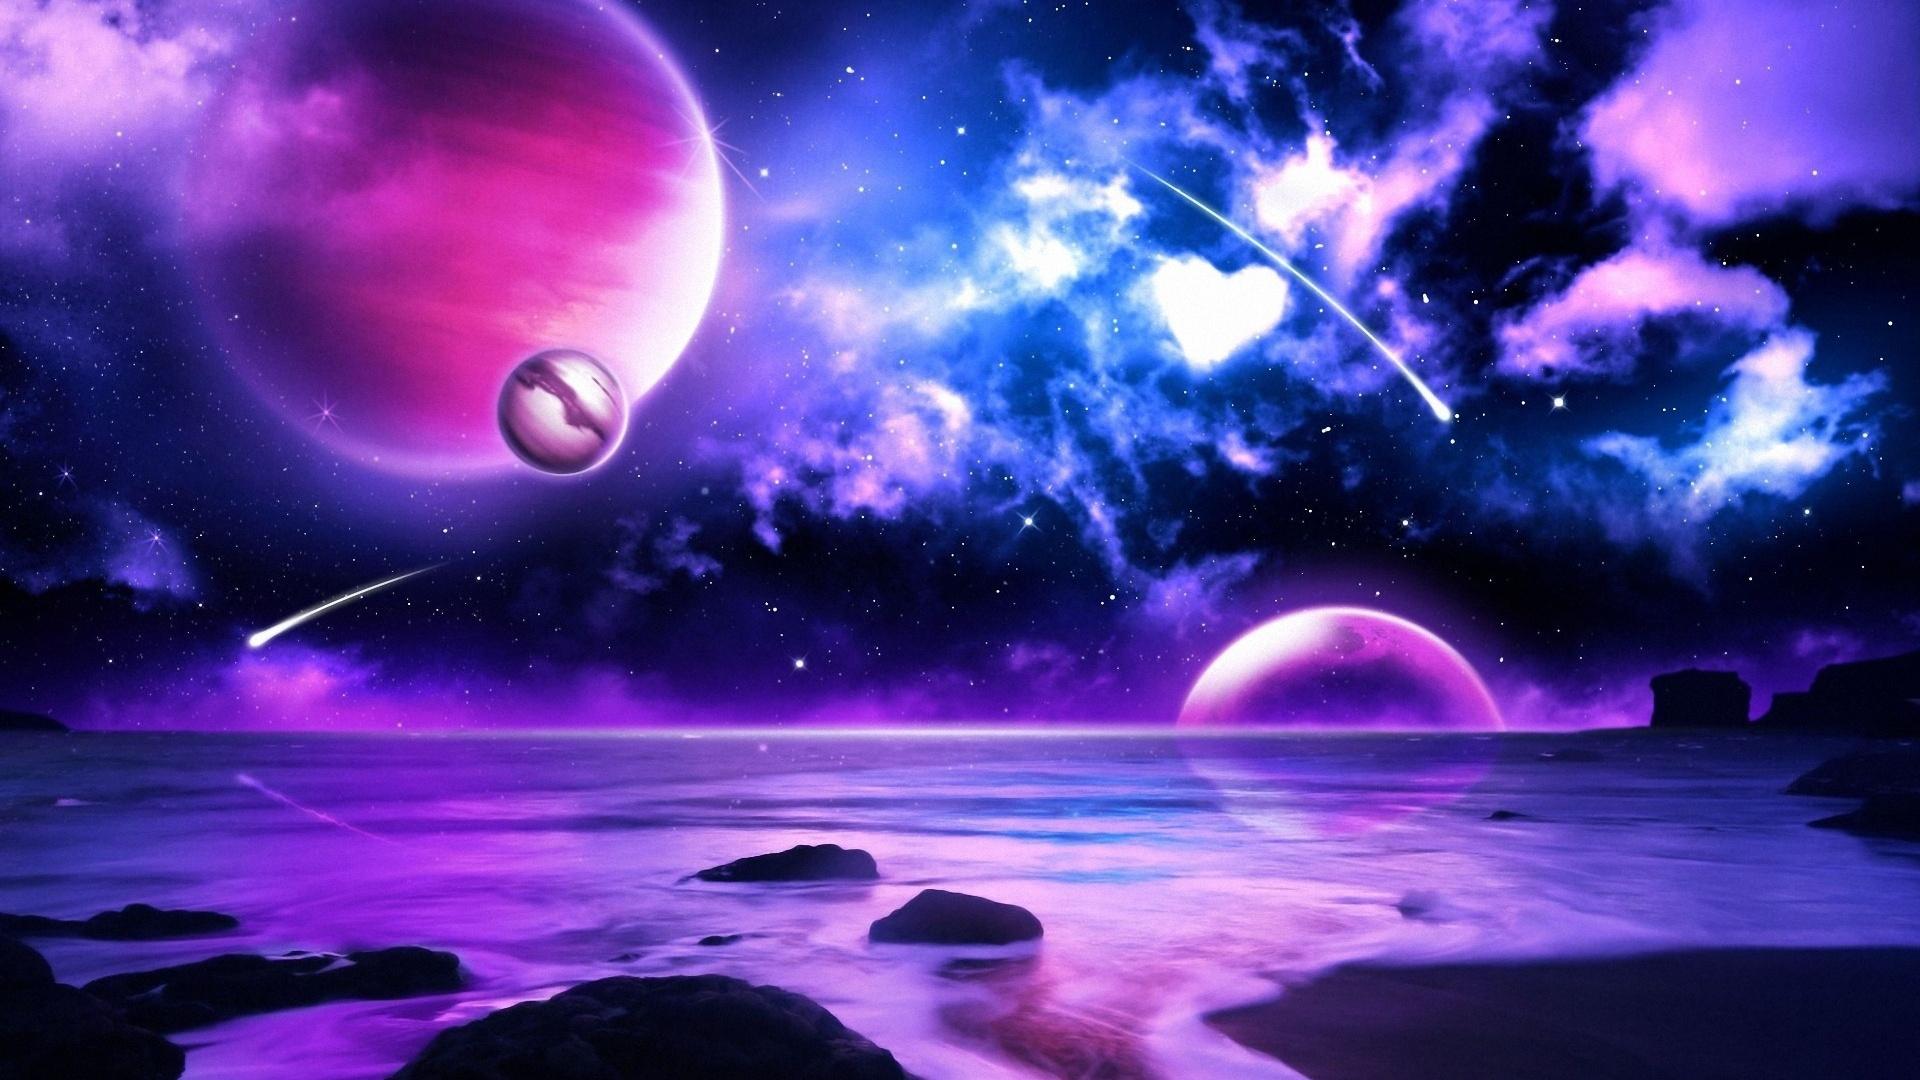 purple space wallpaper Photo